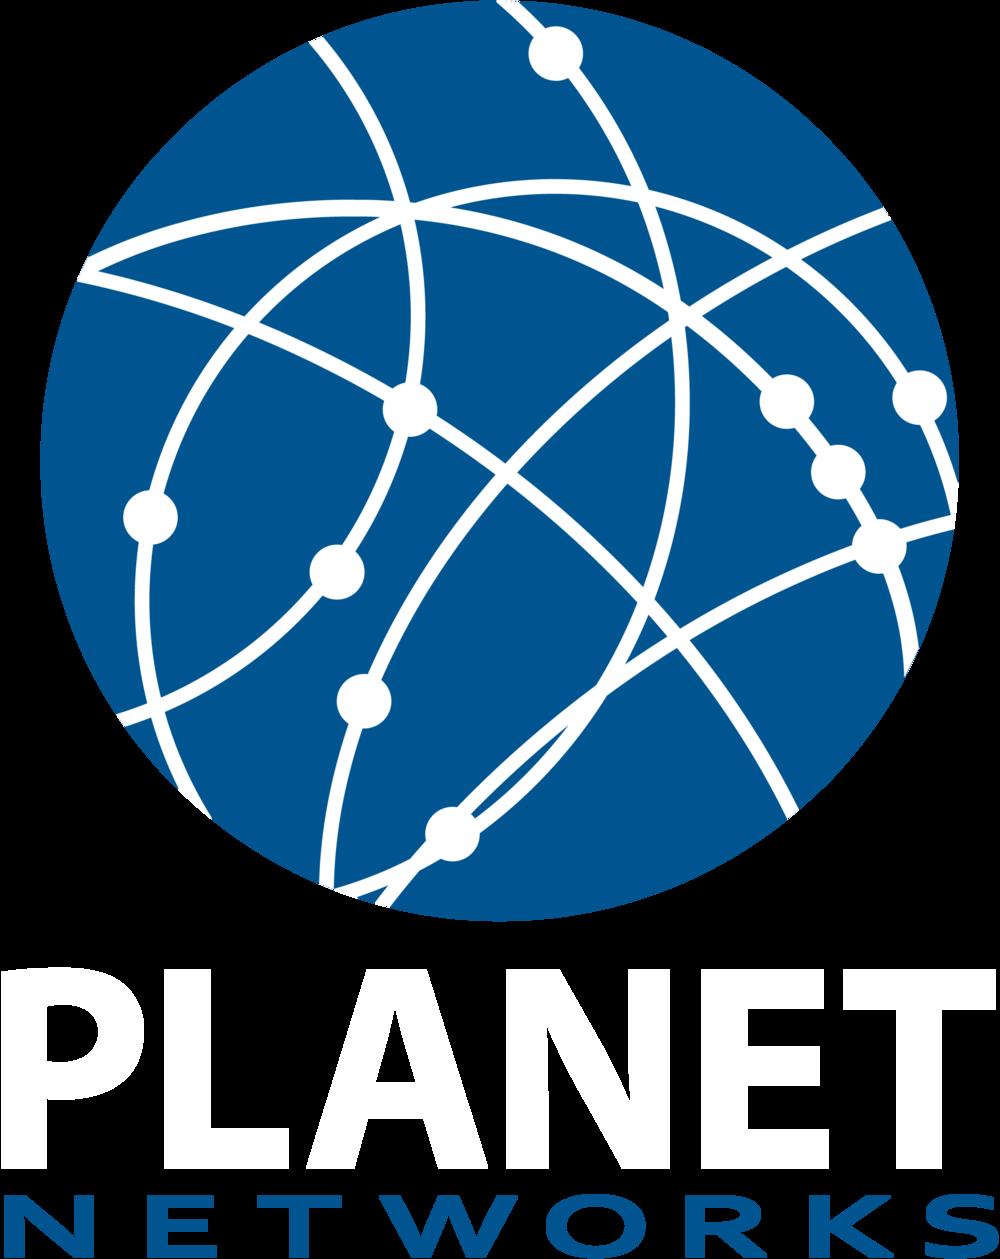 2000 - Archived MOTD — Planet Networks